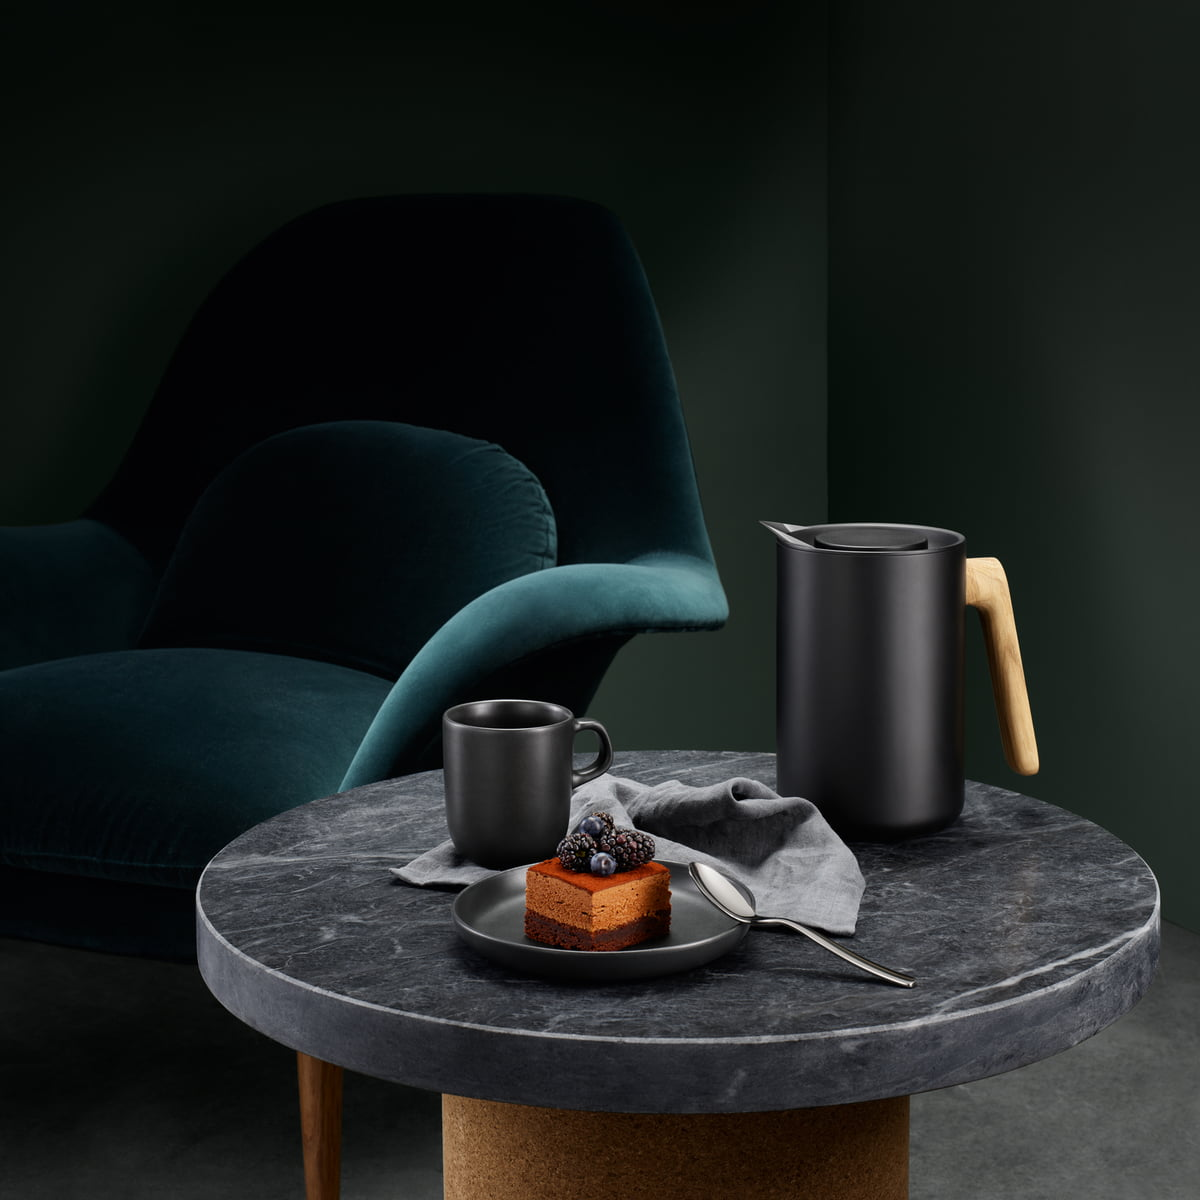 Eva Solo   Nordic Kitchen Thermal Jug, Oak / Black